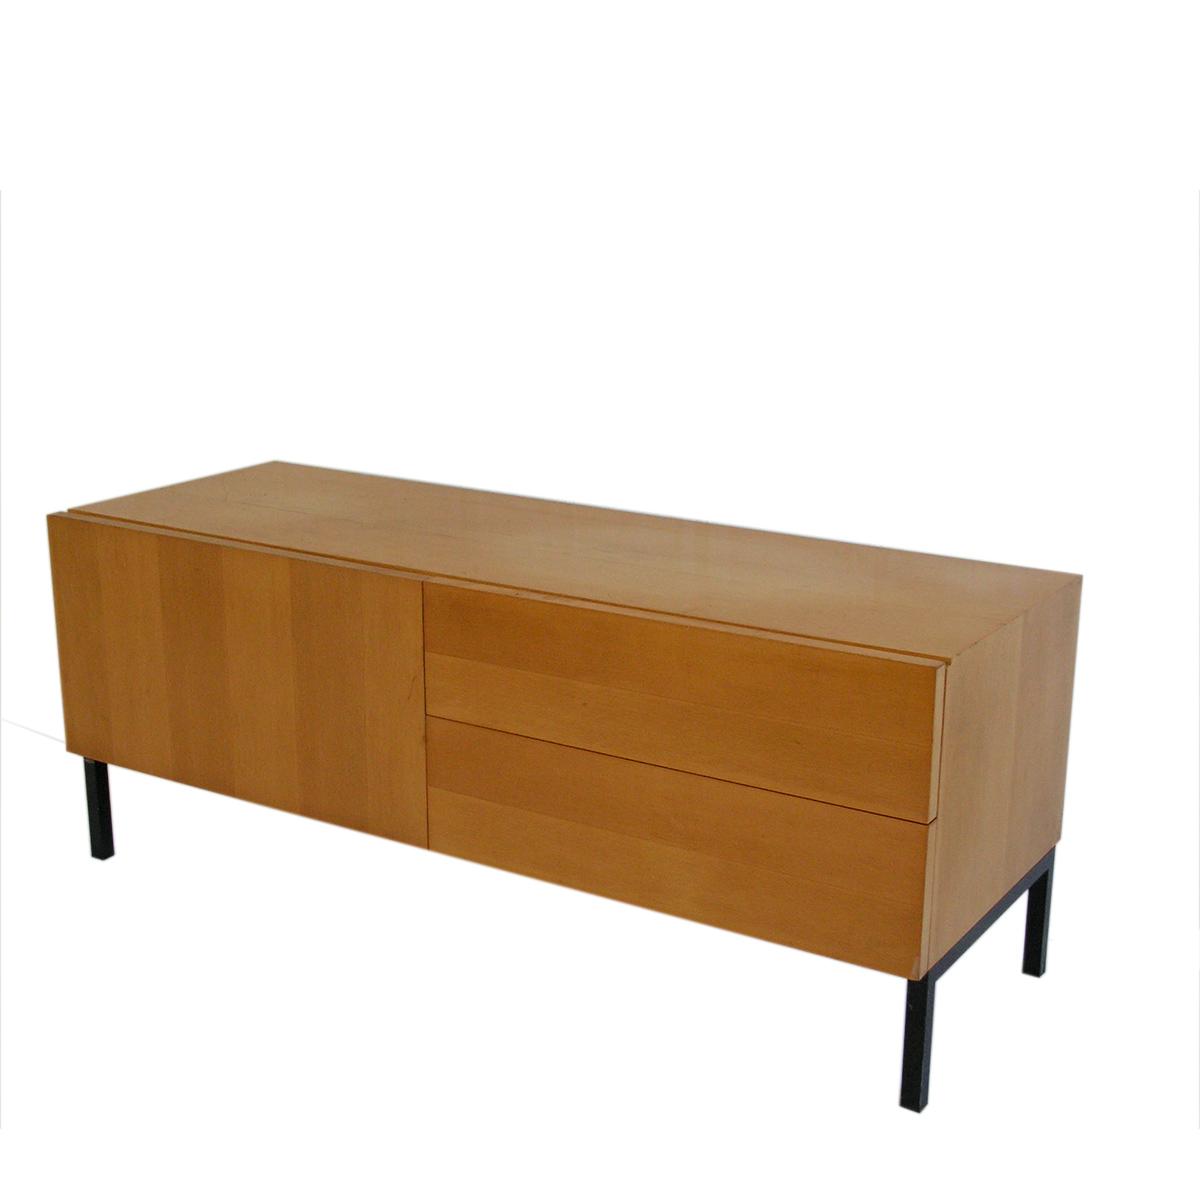 Pictures Of Bookshelves Low Sideboard Victoria Artichoke Vintage Furniture